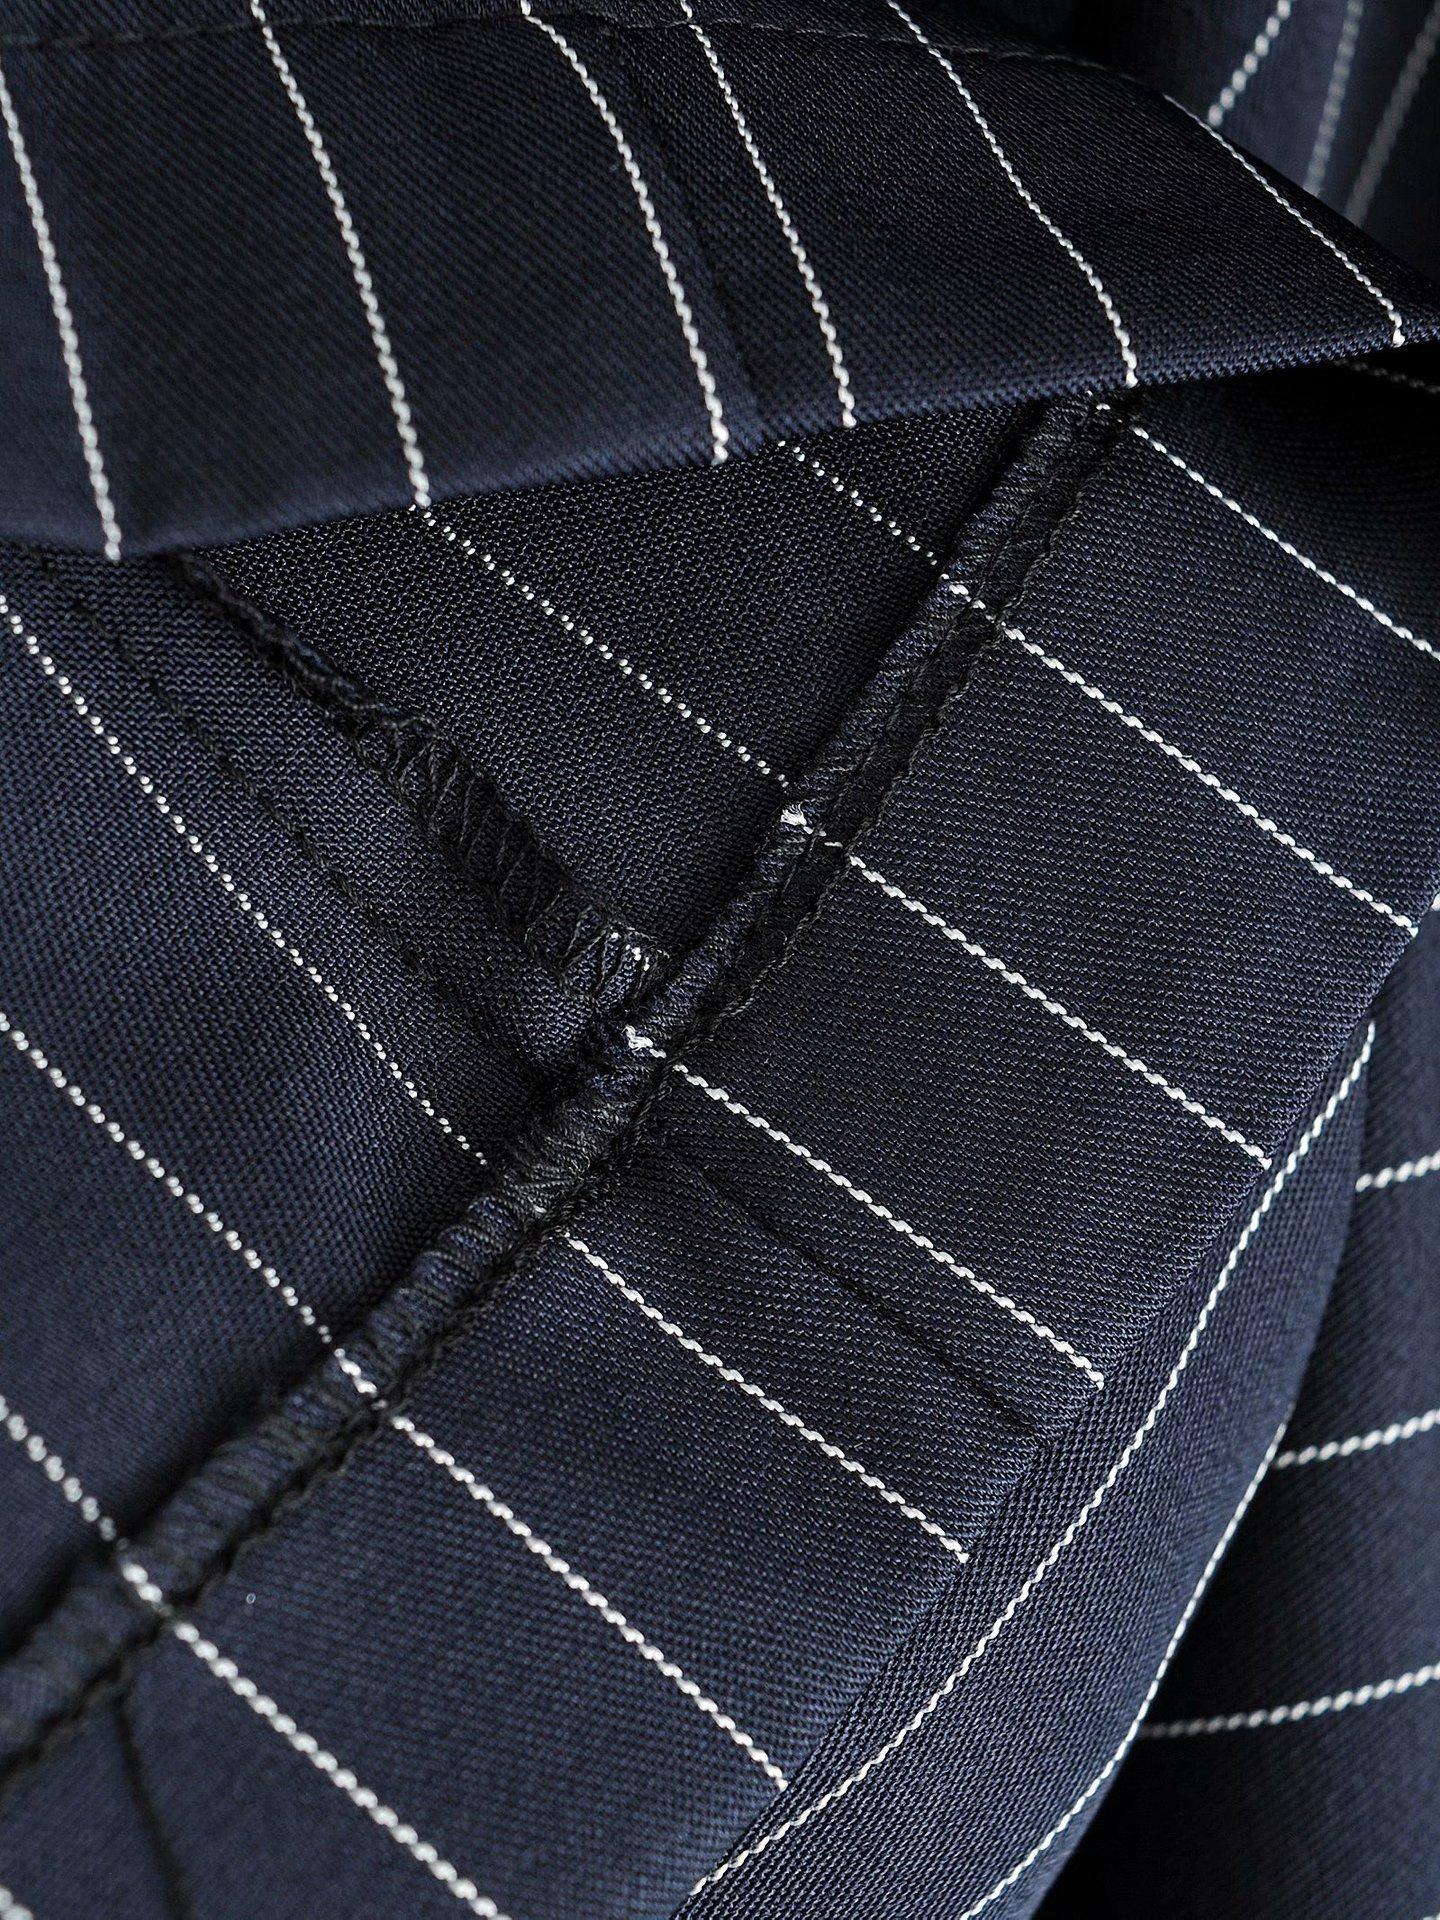 autumn women s single-breasted back-hollow lapel suit striped dress nihaostyles wholesale clothing NSXPF79671